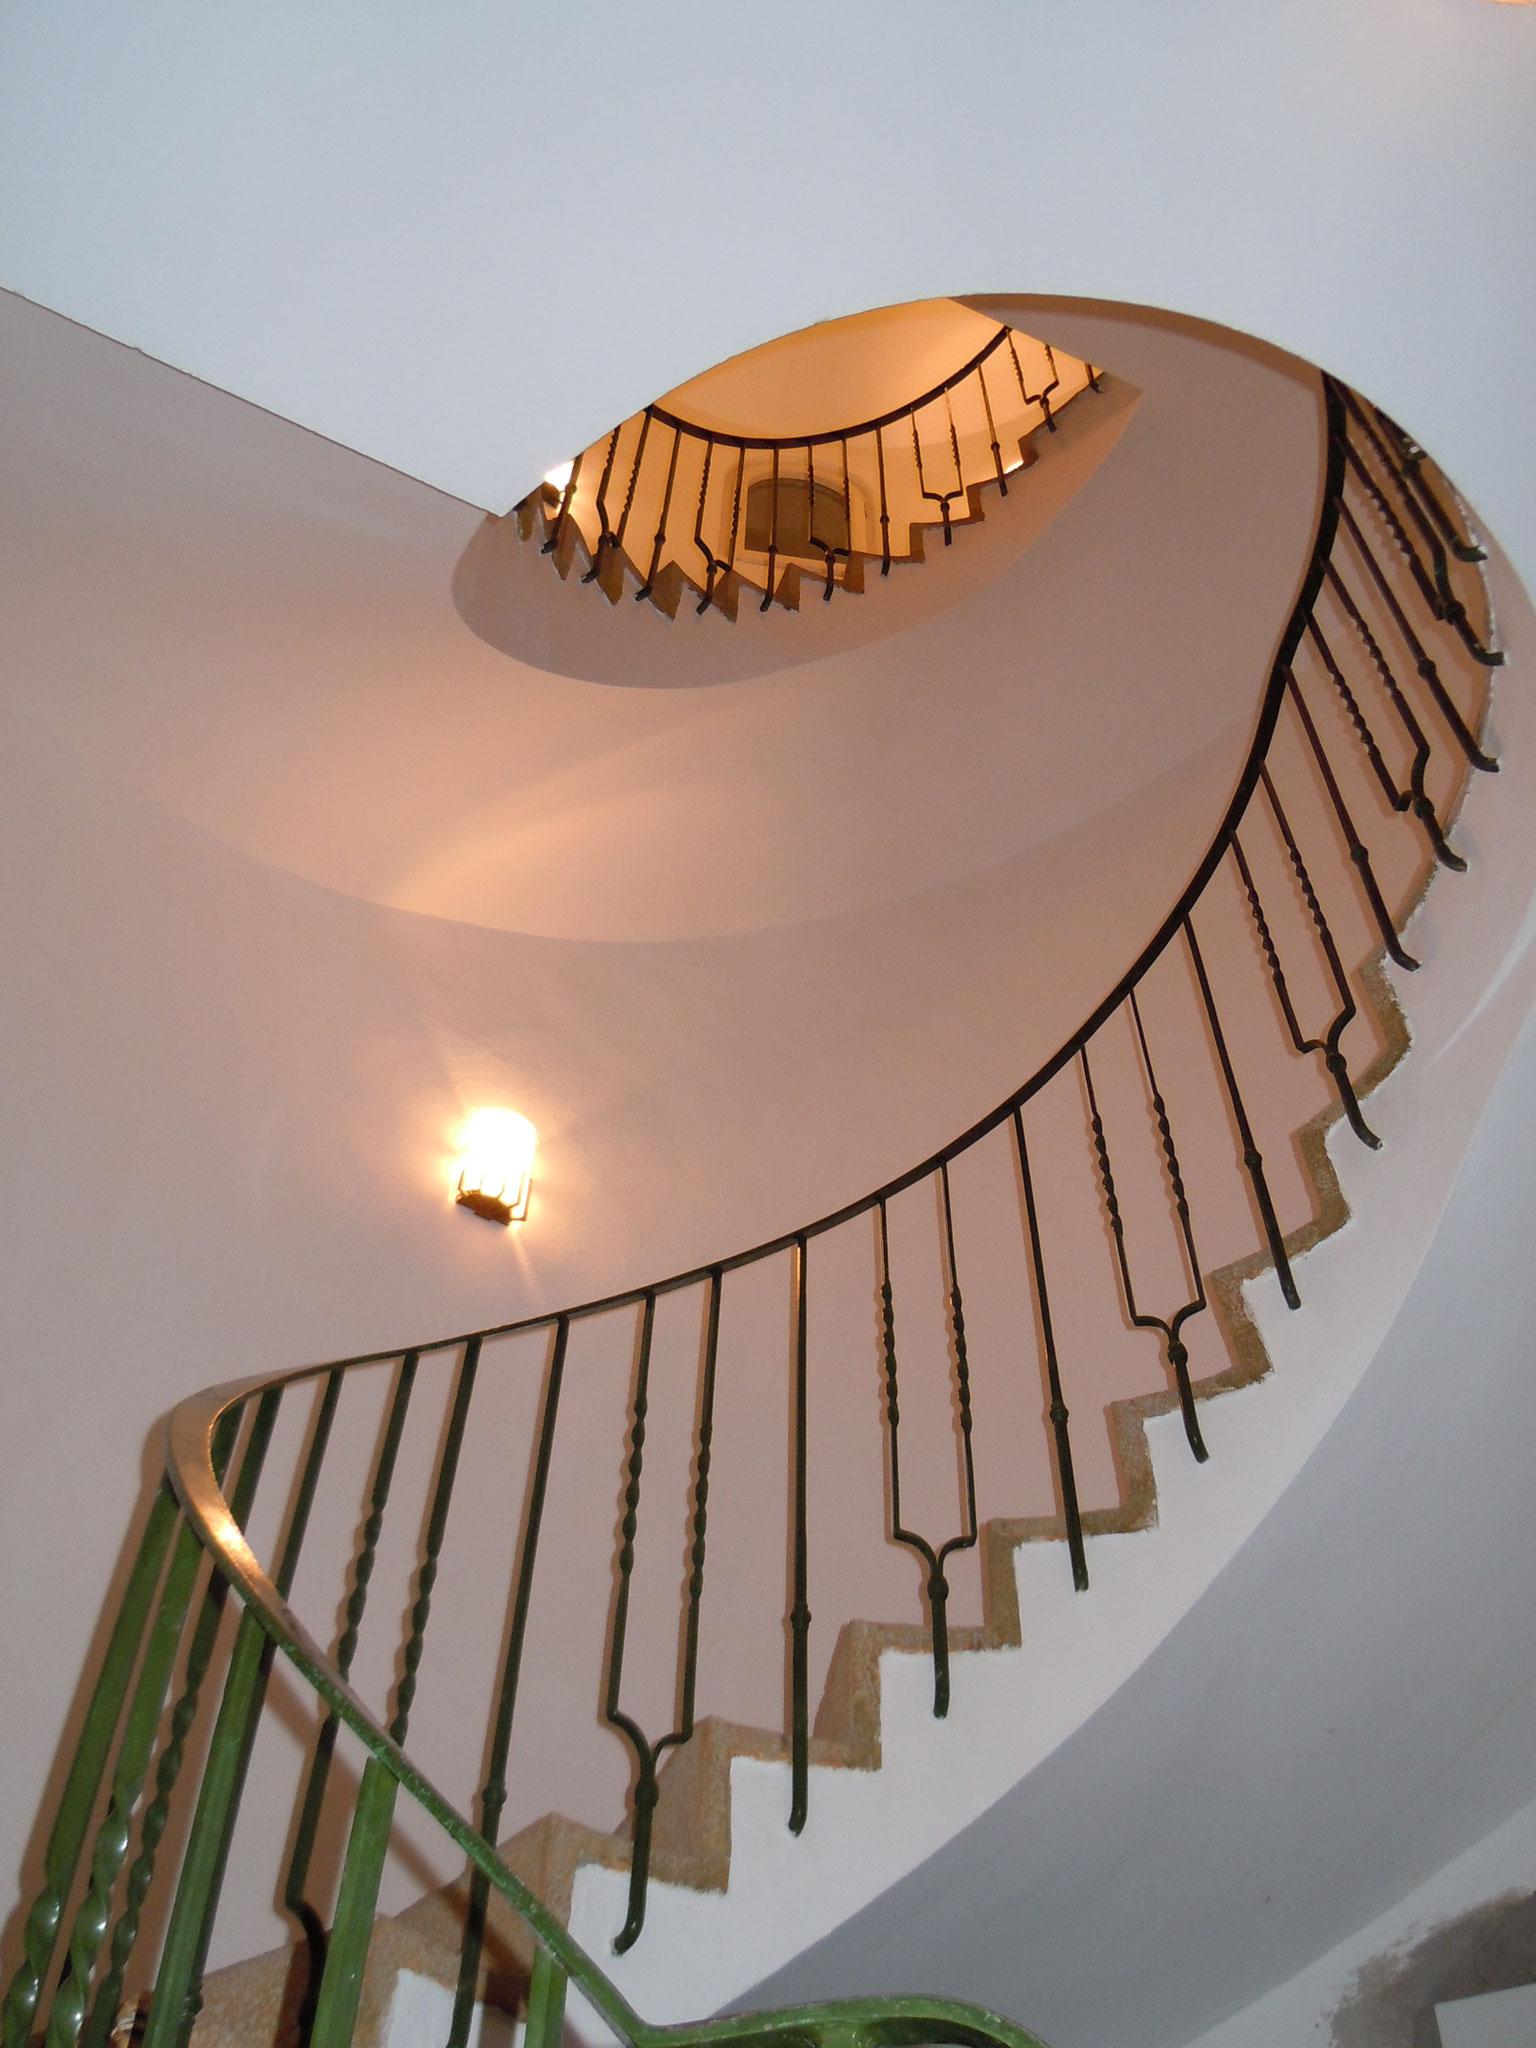 The tower interior stairway